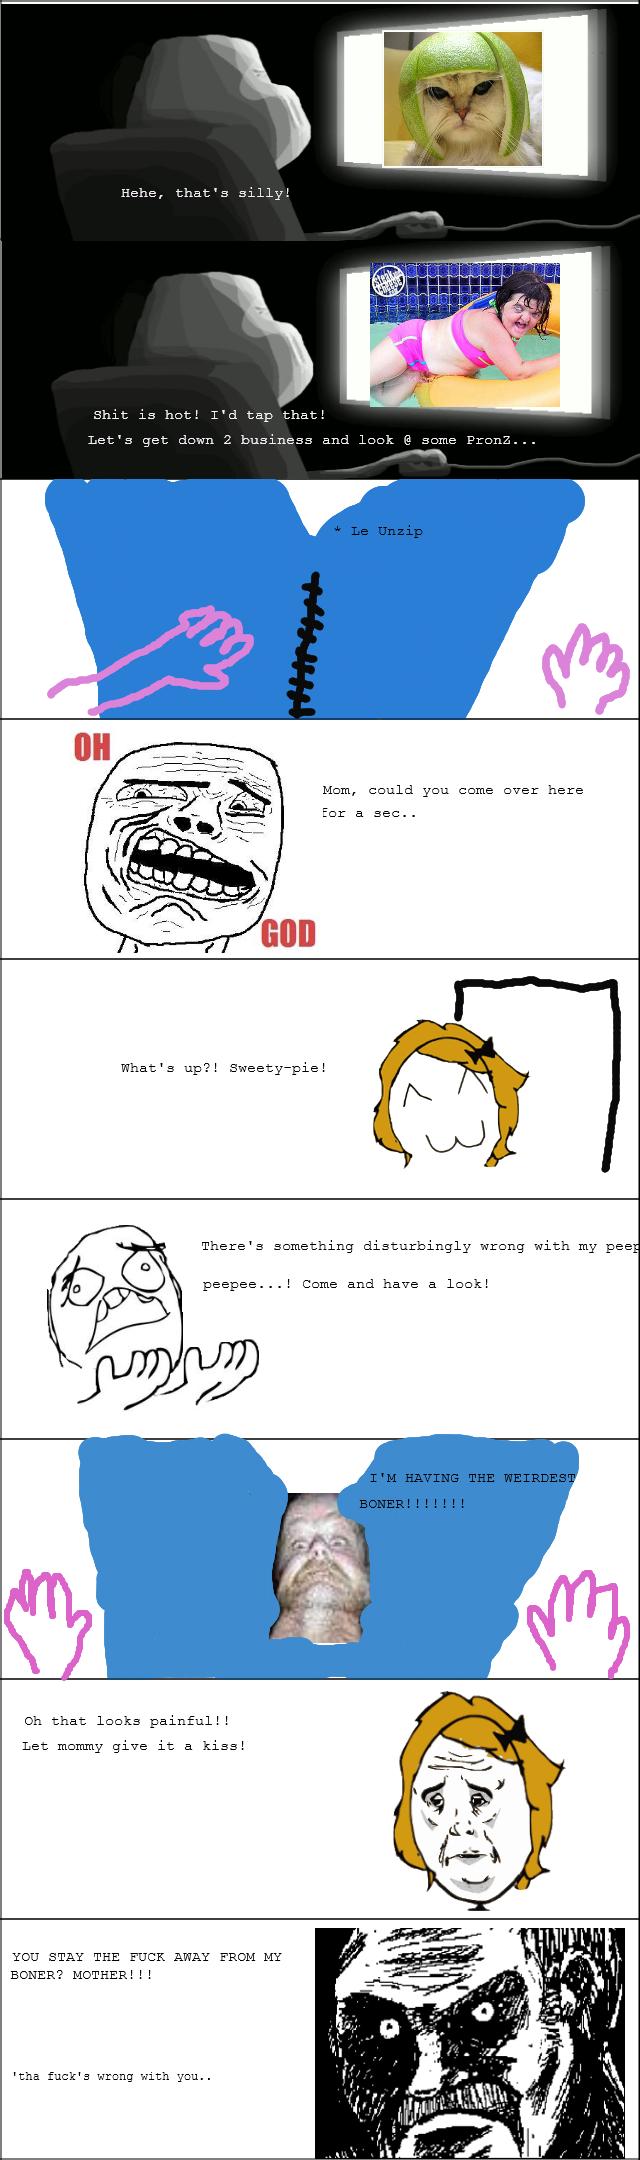 WTF, mom!!. .